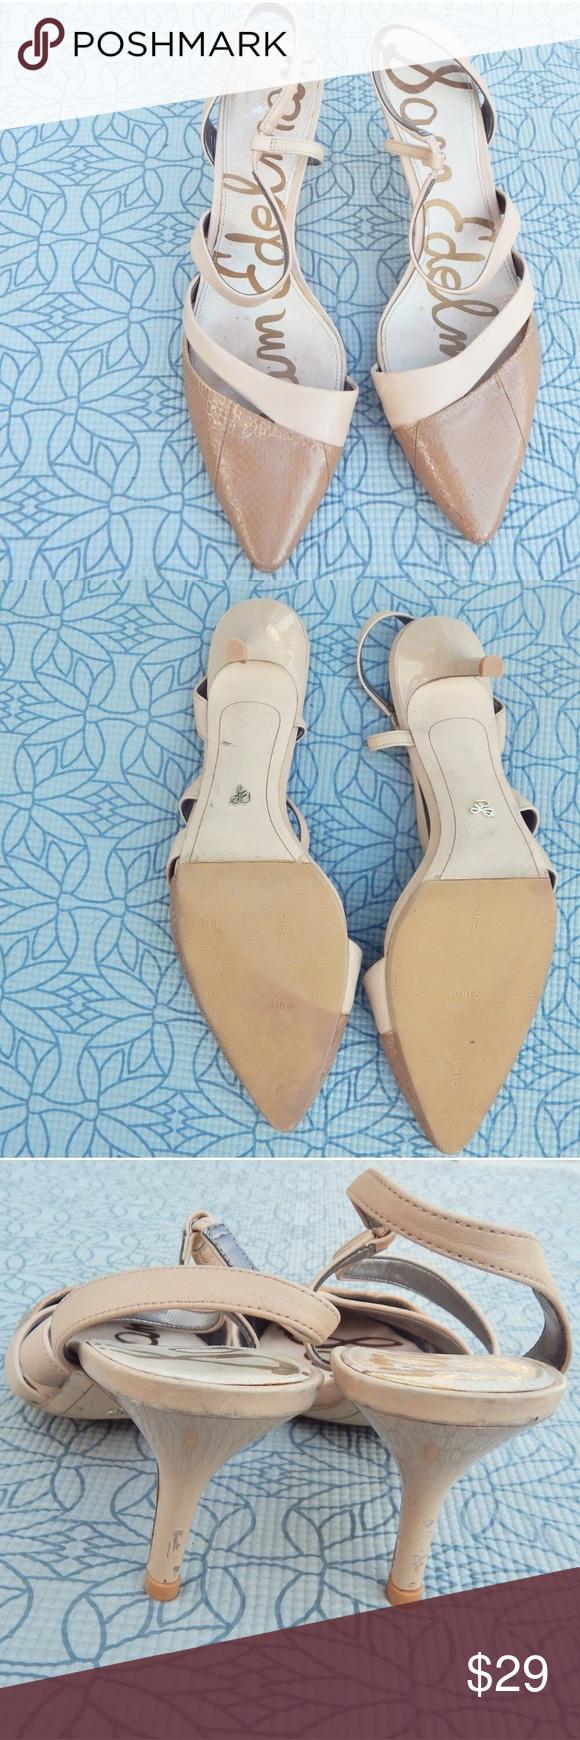 Sam Edelman Nude Pointed Heels Beautiful sam edelman heels. Sam Edelman Shoes Heels